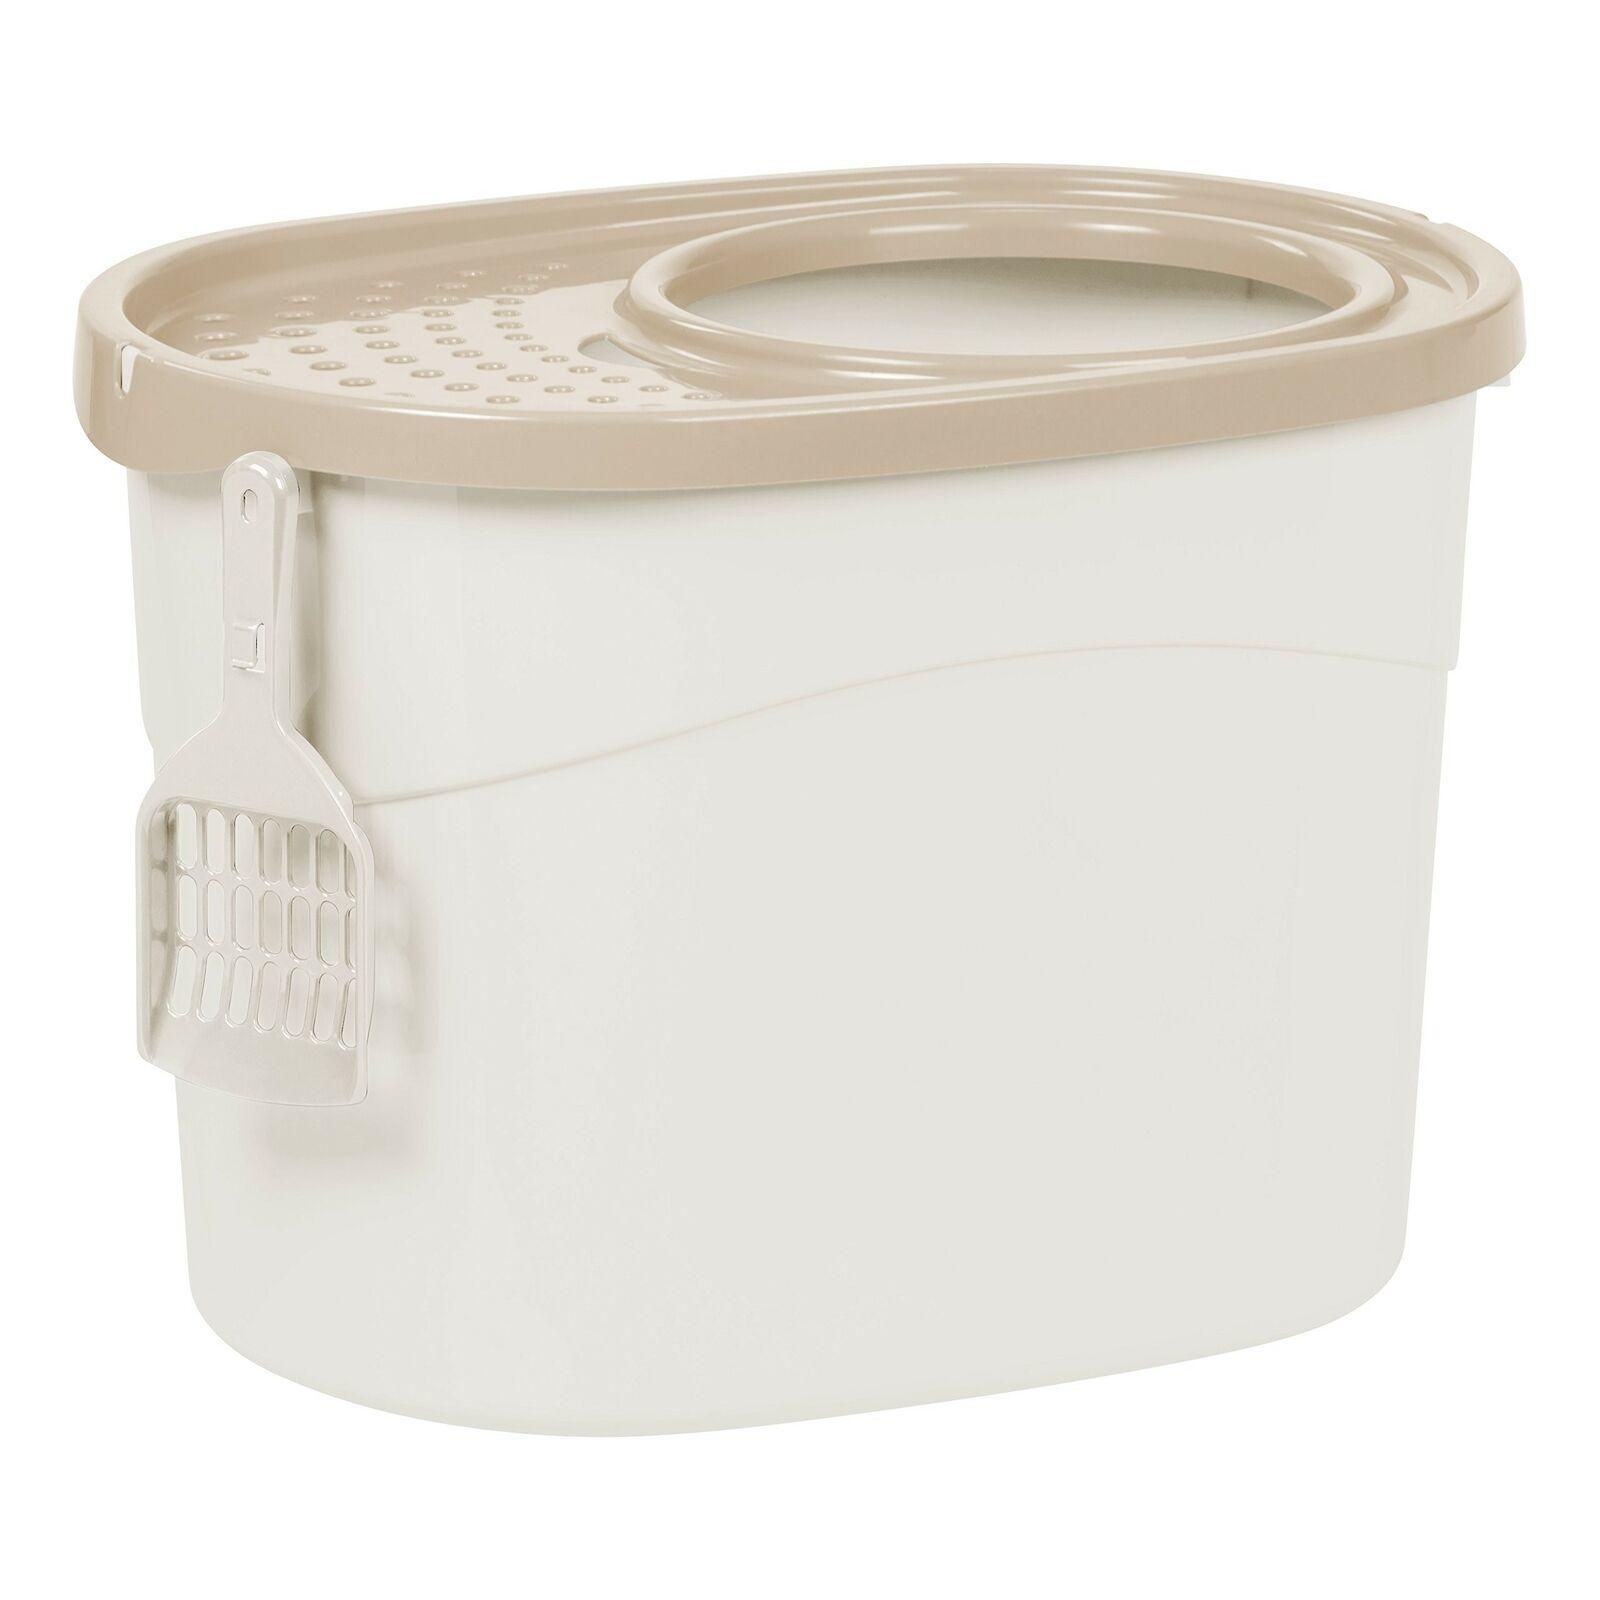 Iris Ohyama Top Entry Cat Litter Box White, Beige, One Size